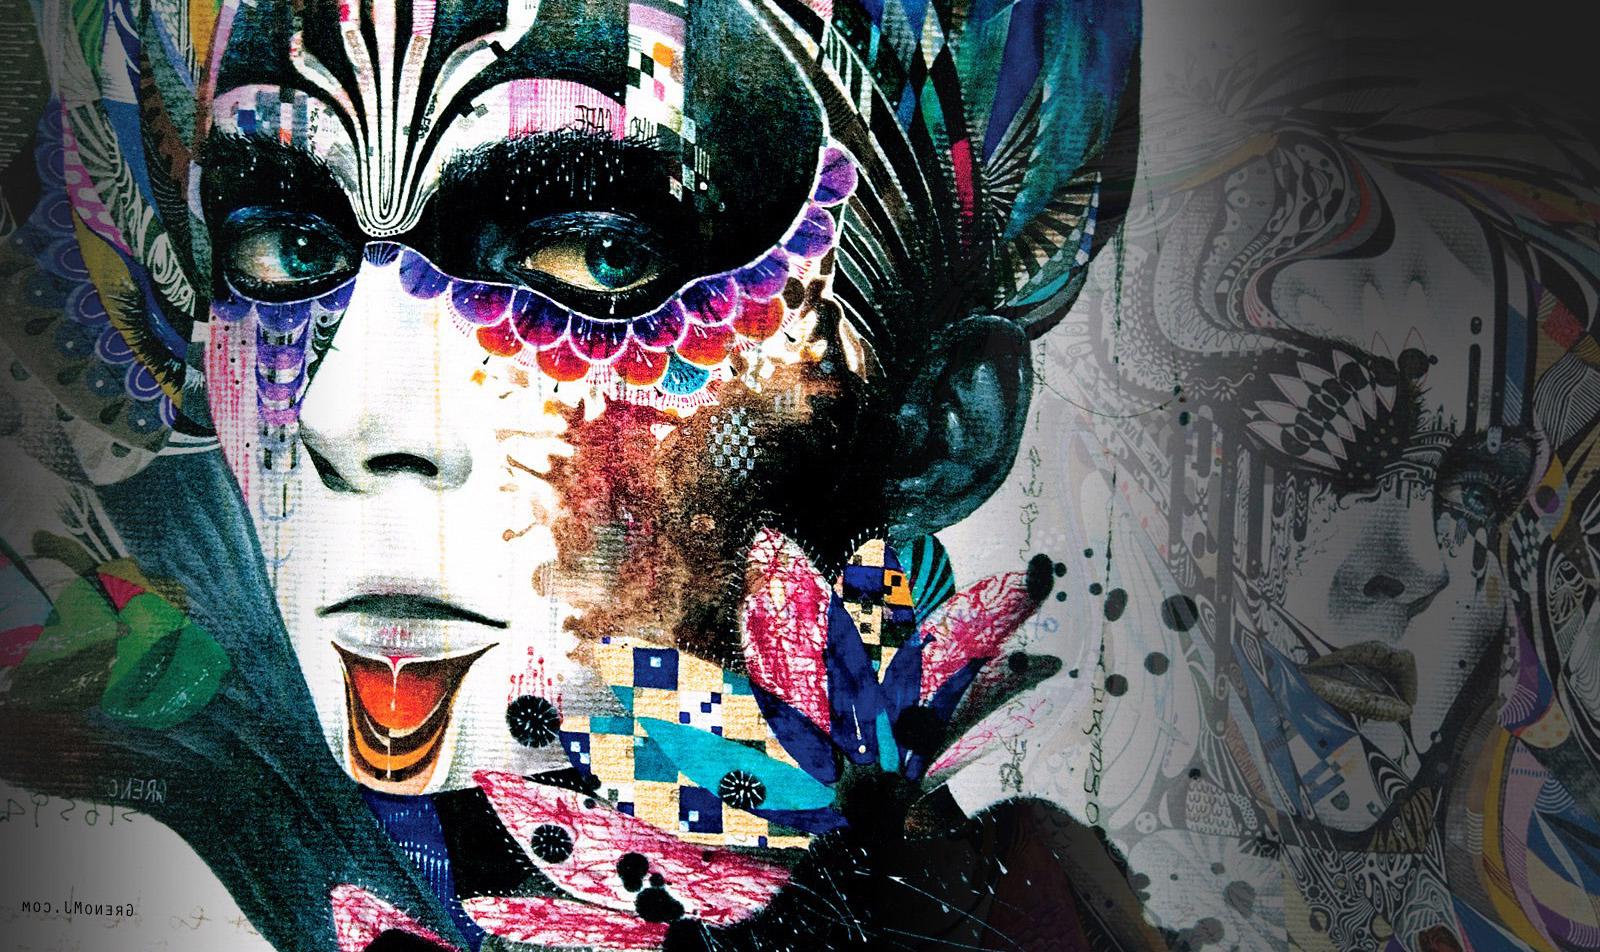 Wallpaper Illustration Graphic Design Roar Movie: Baggrunde : Plads, Grafisk Design, Gadekunst, Skitsere Op